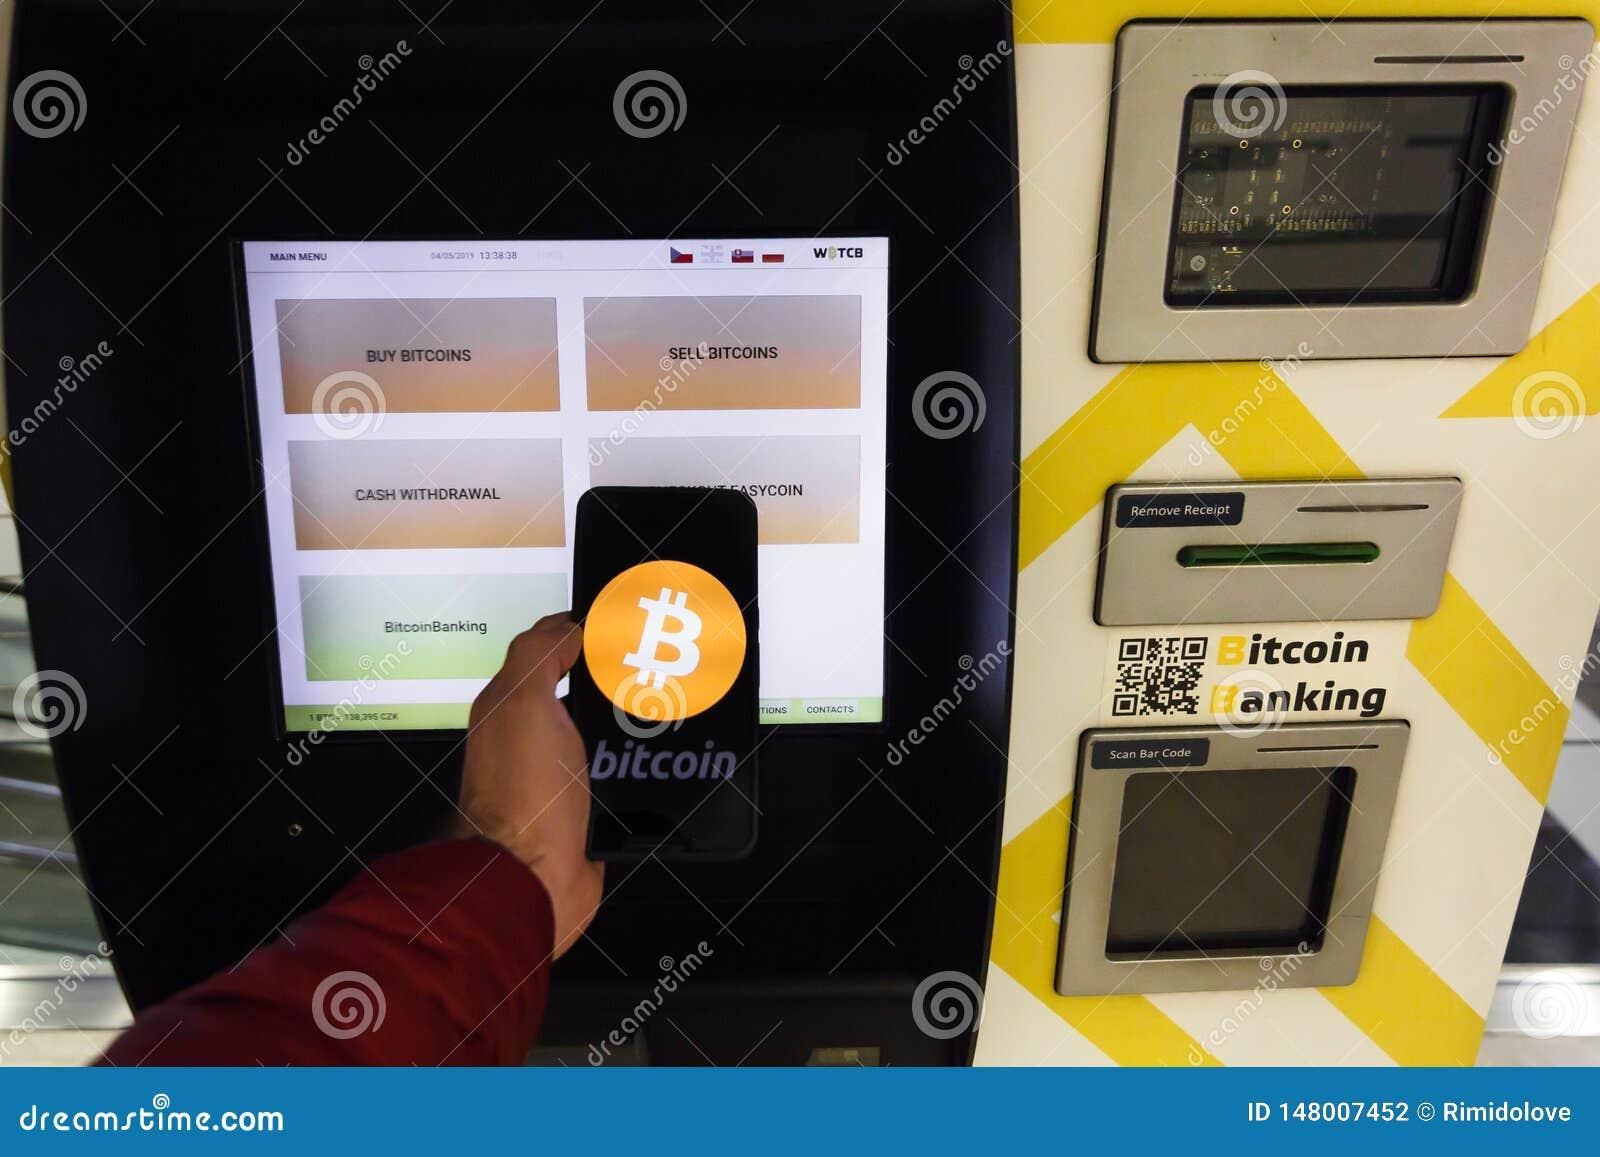 bitcoin atm prague)